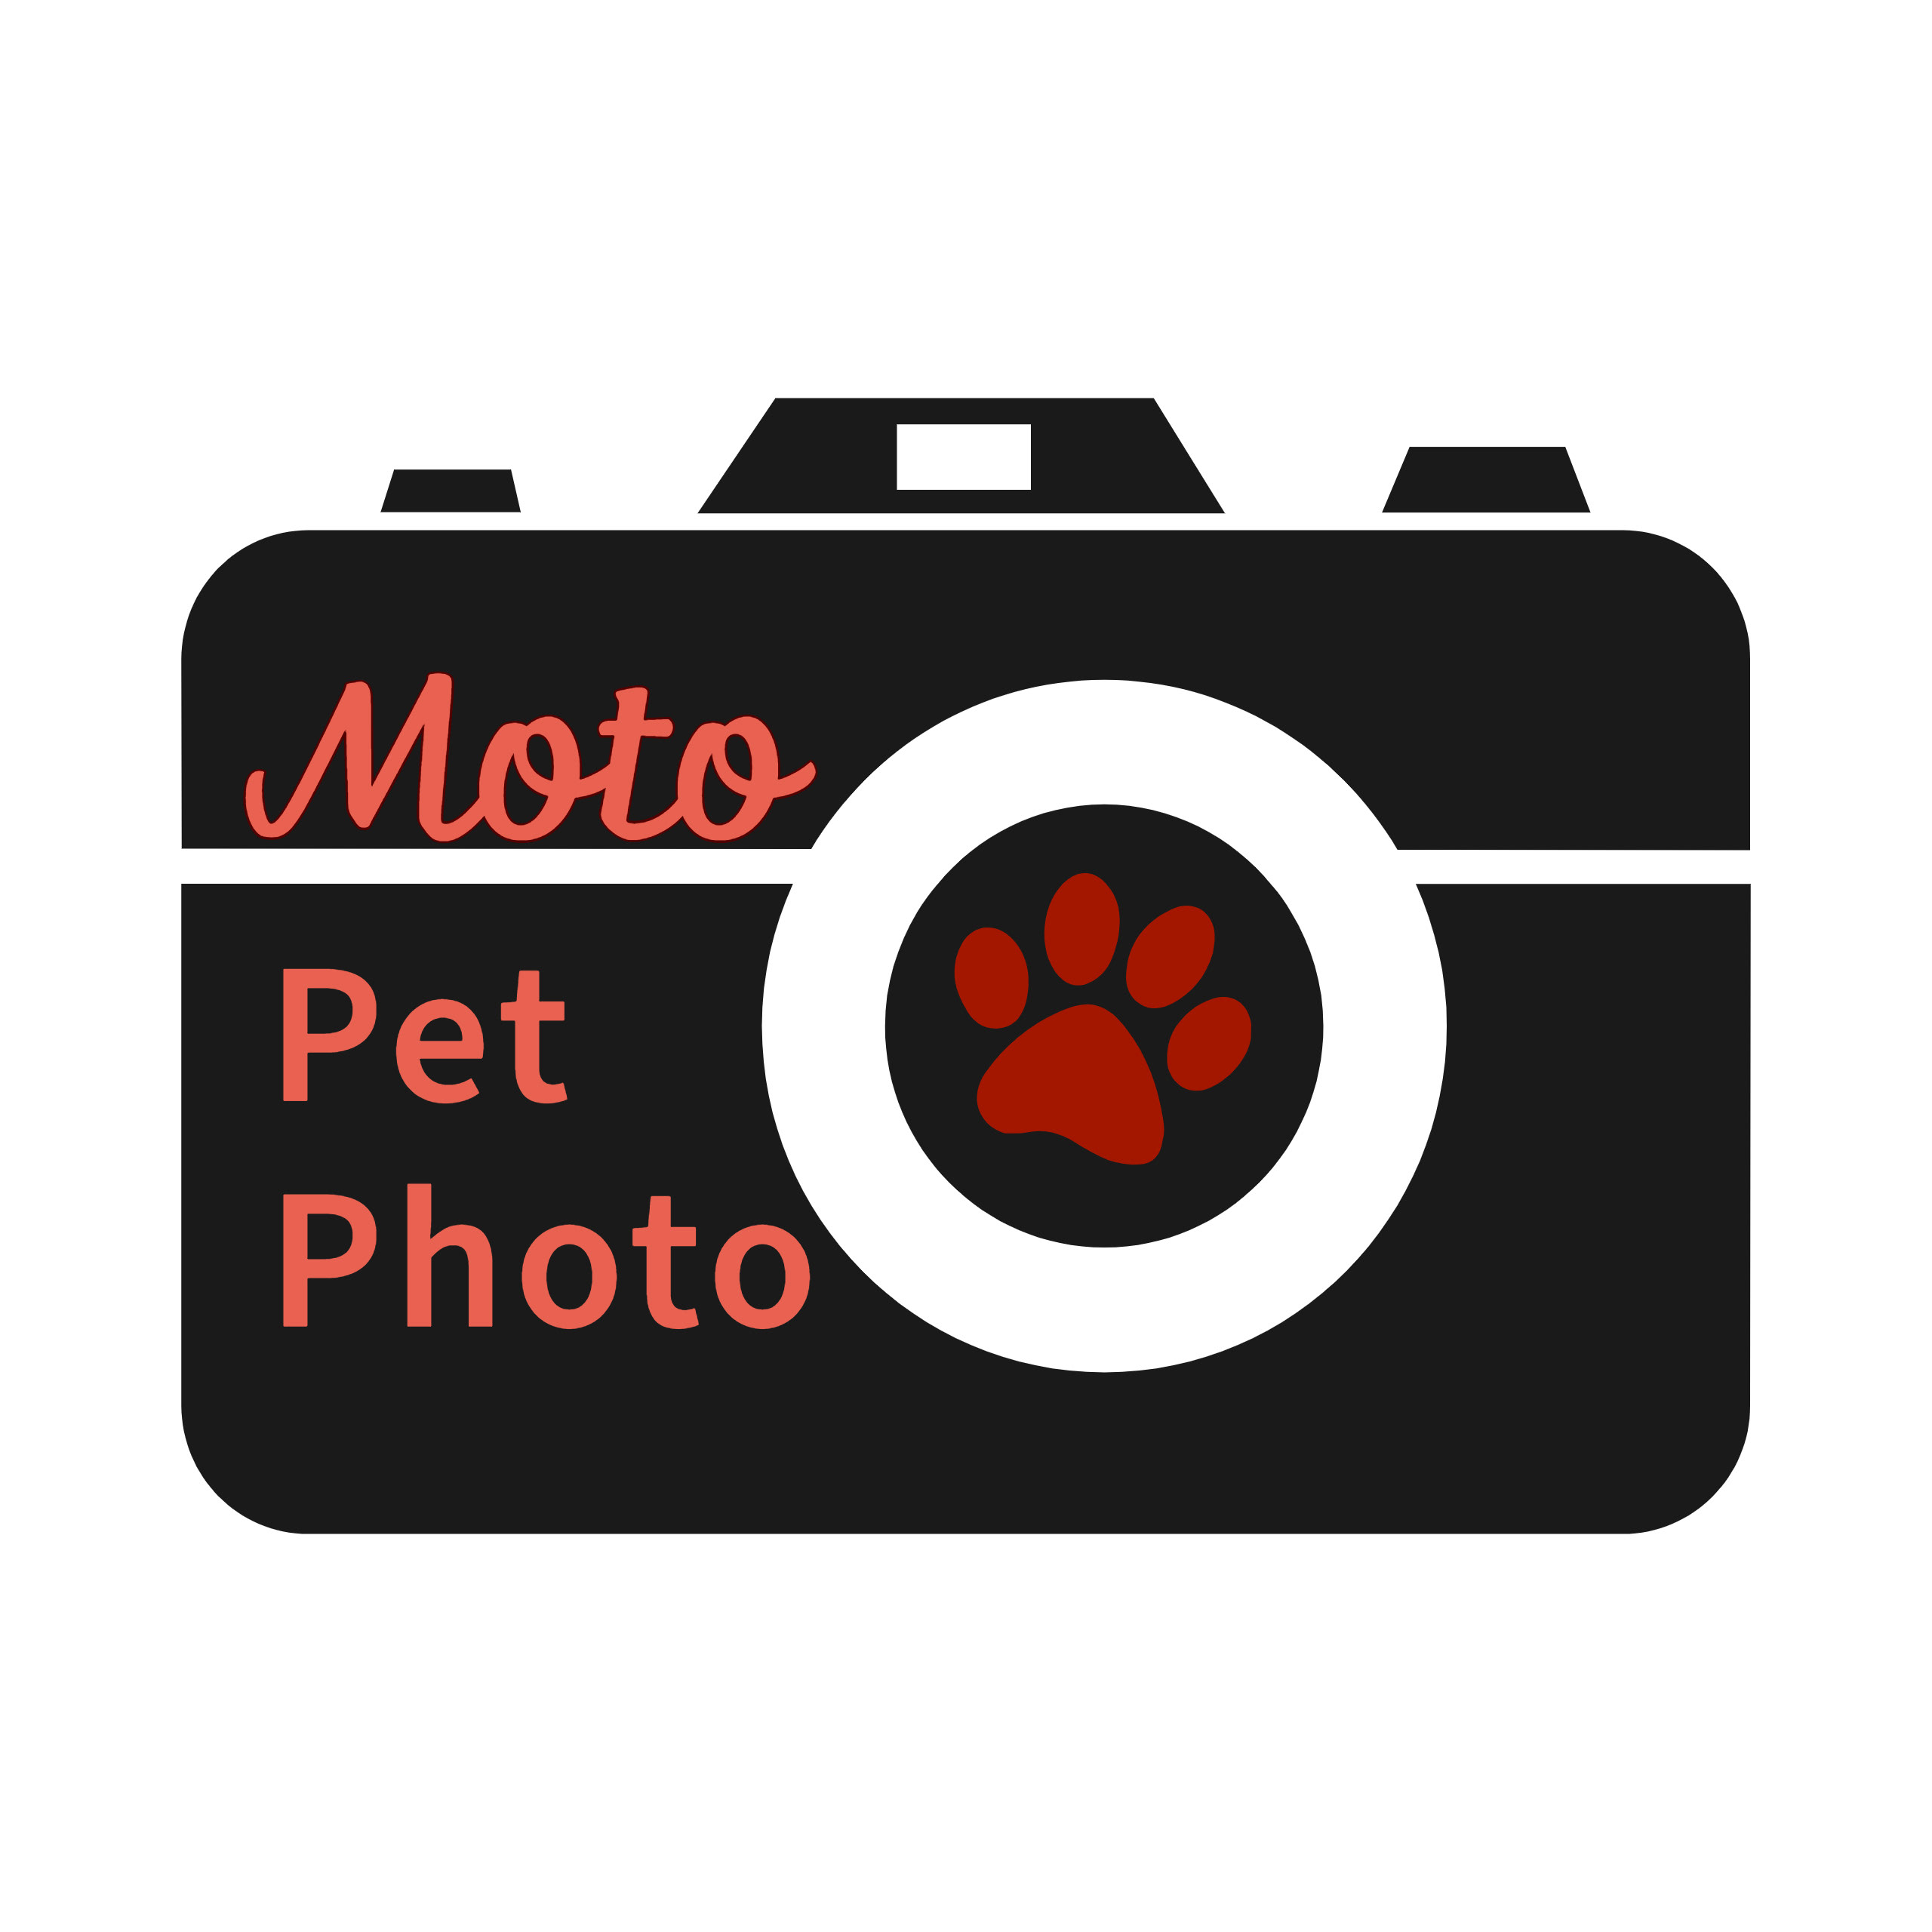 Moto Pet Photo